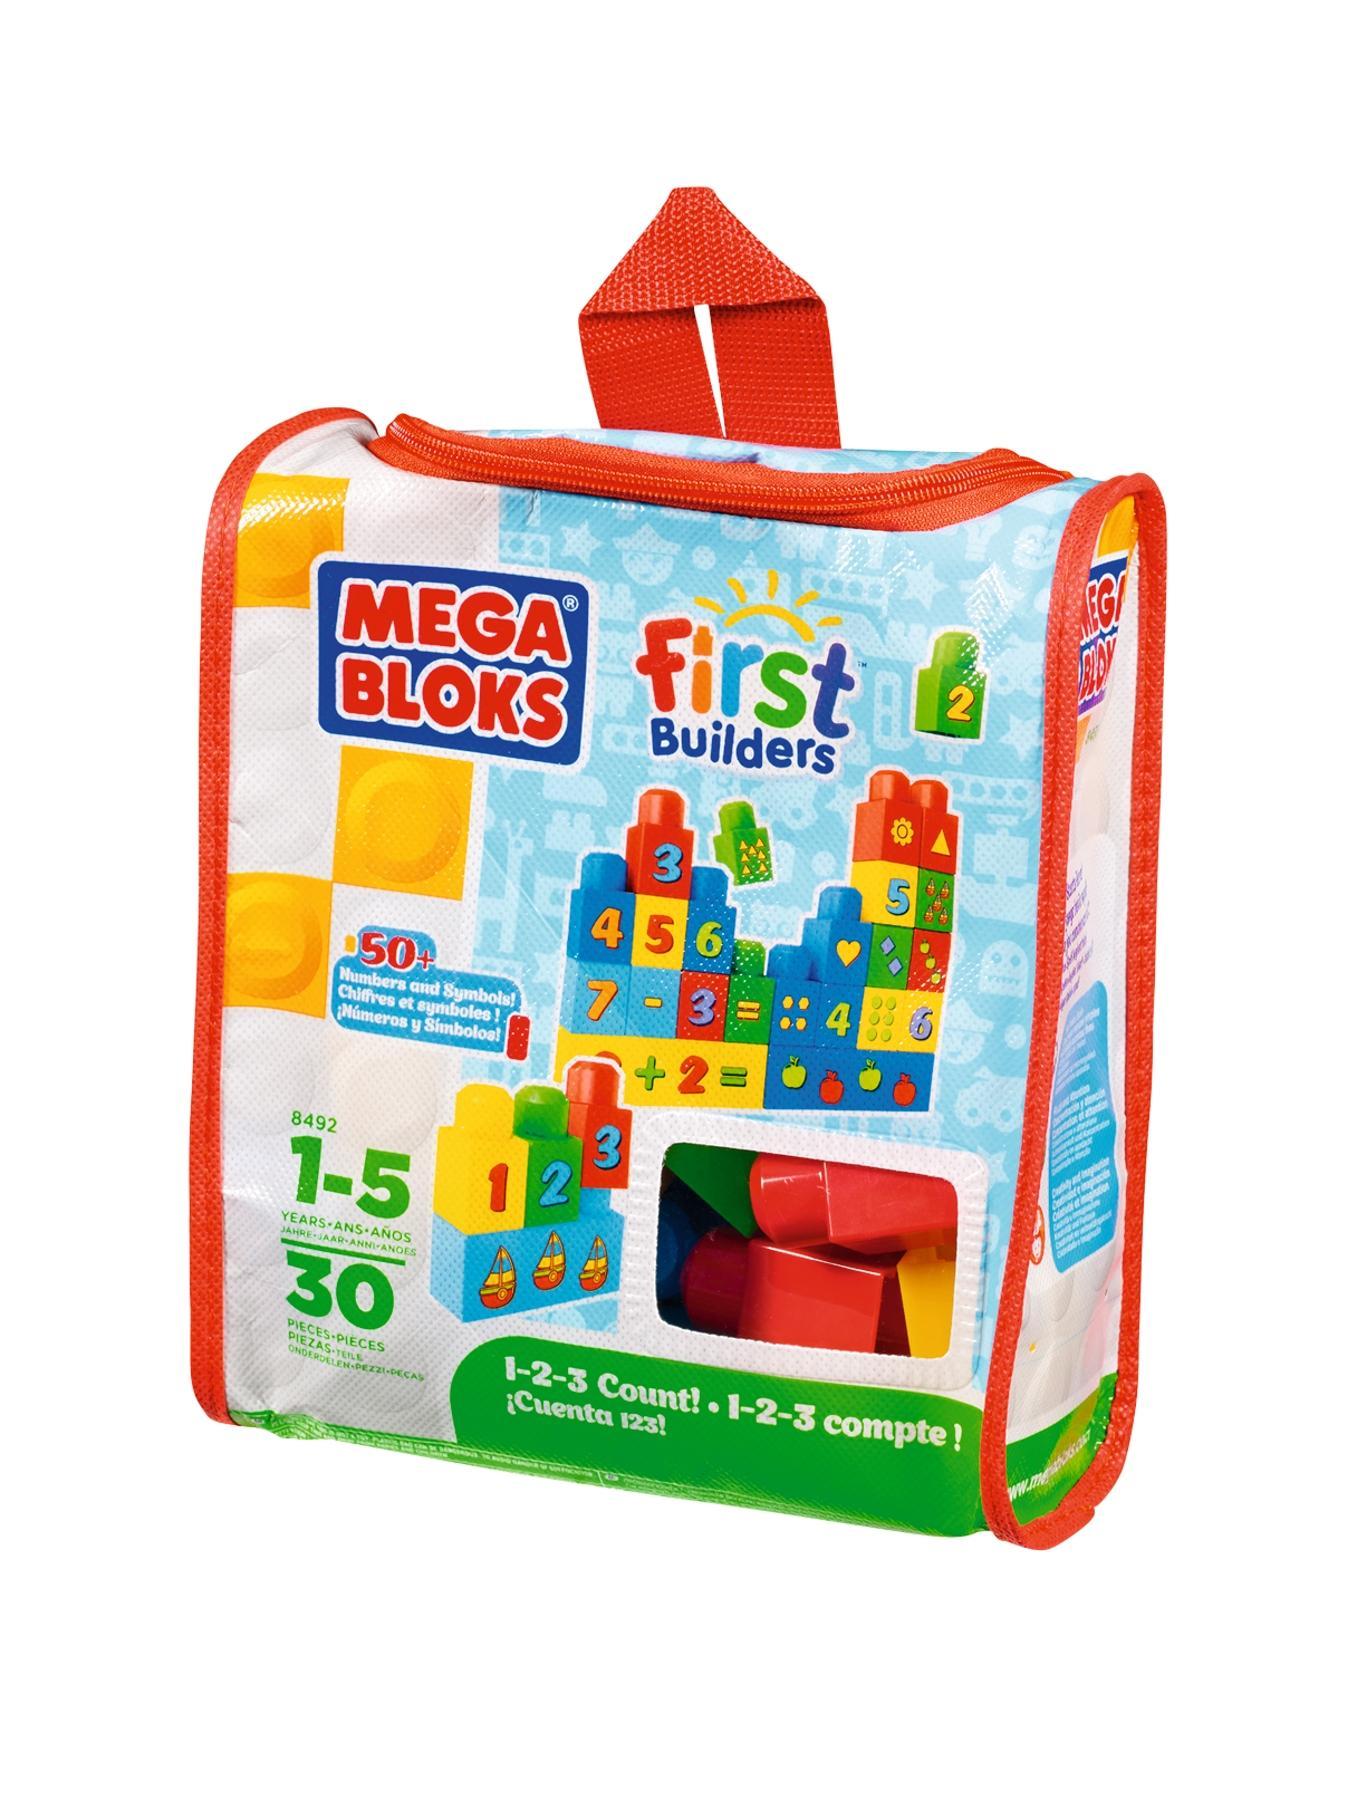 Megabloks First Builders 1-2-3 Count Bag